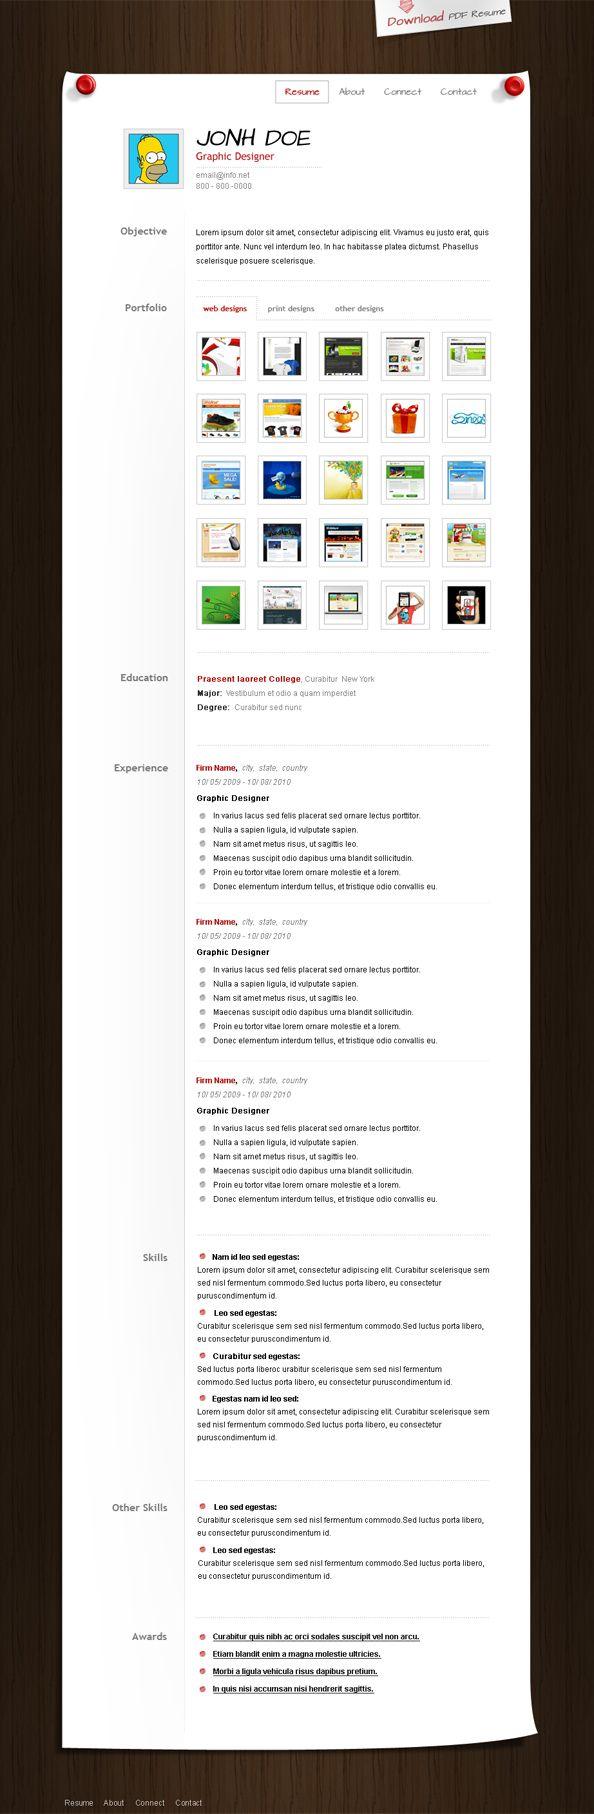 Resume Design A Resume Online best 25 online cv template ideas on pinterest nice 15 free resume templates psd professionally designed templates